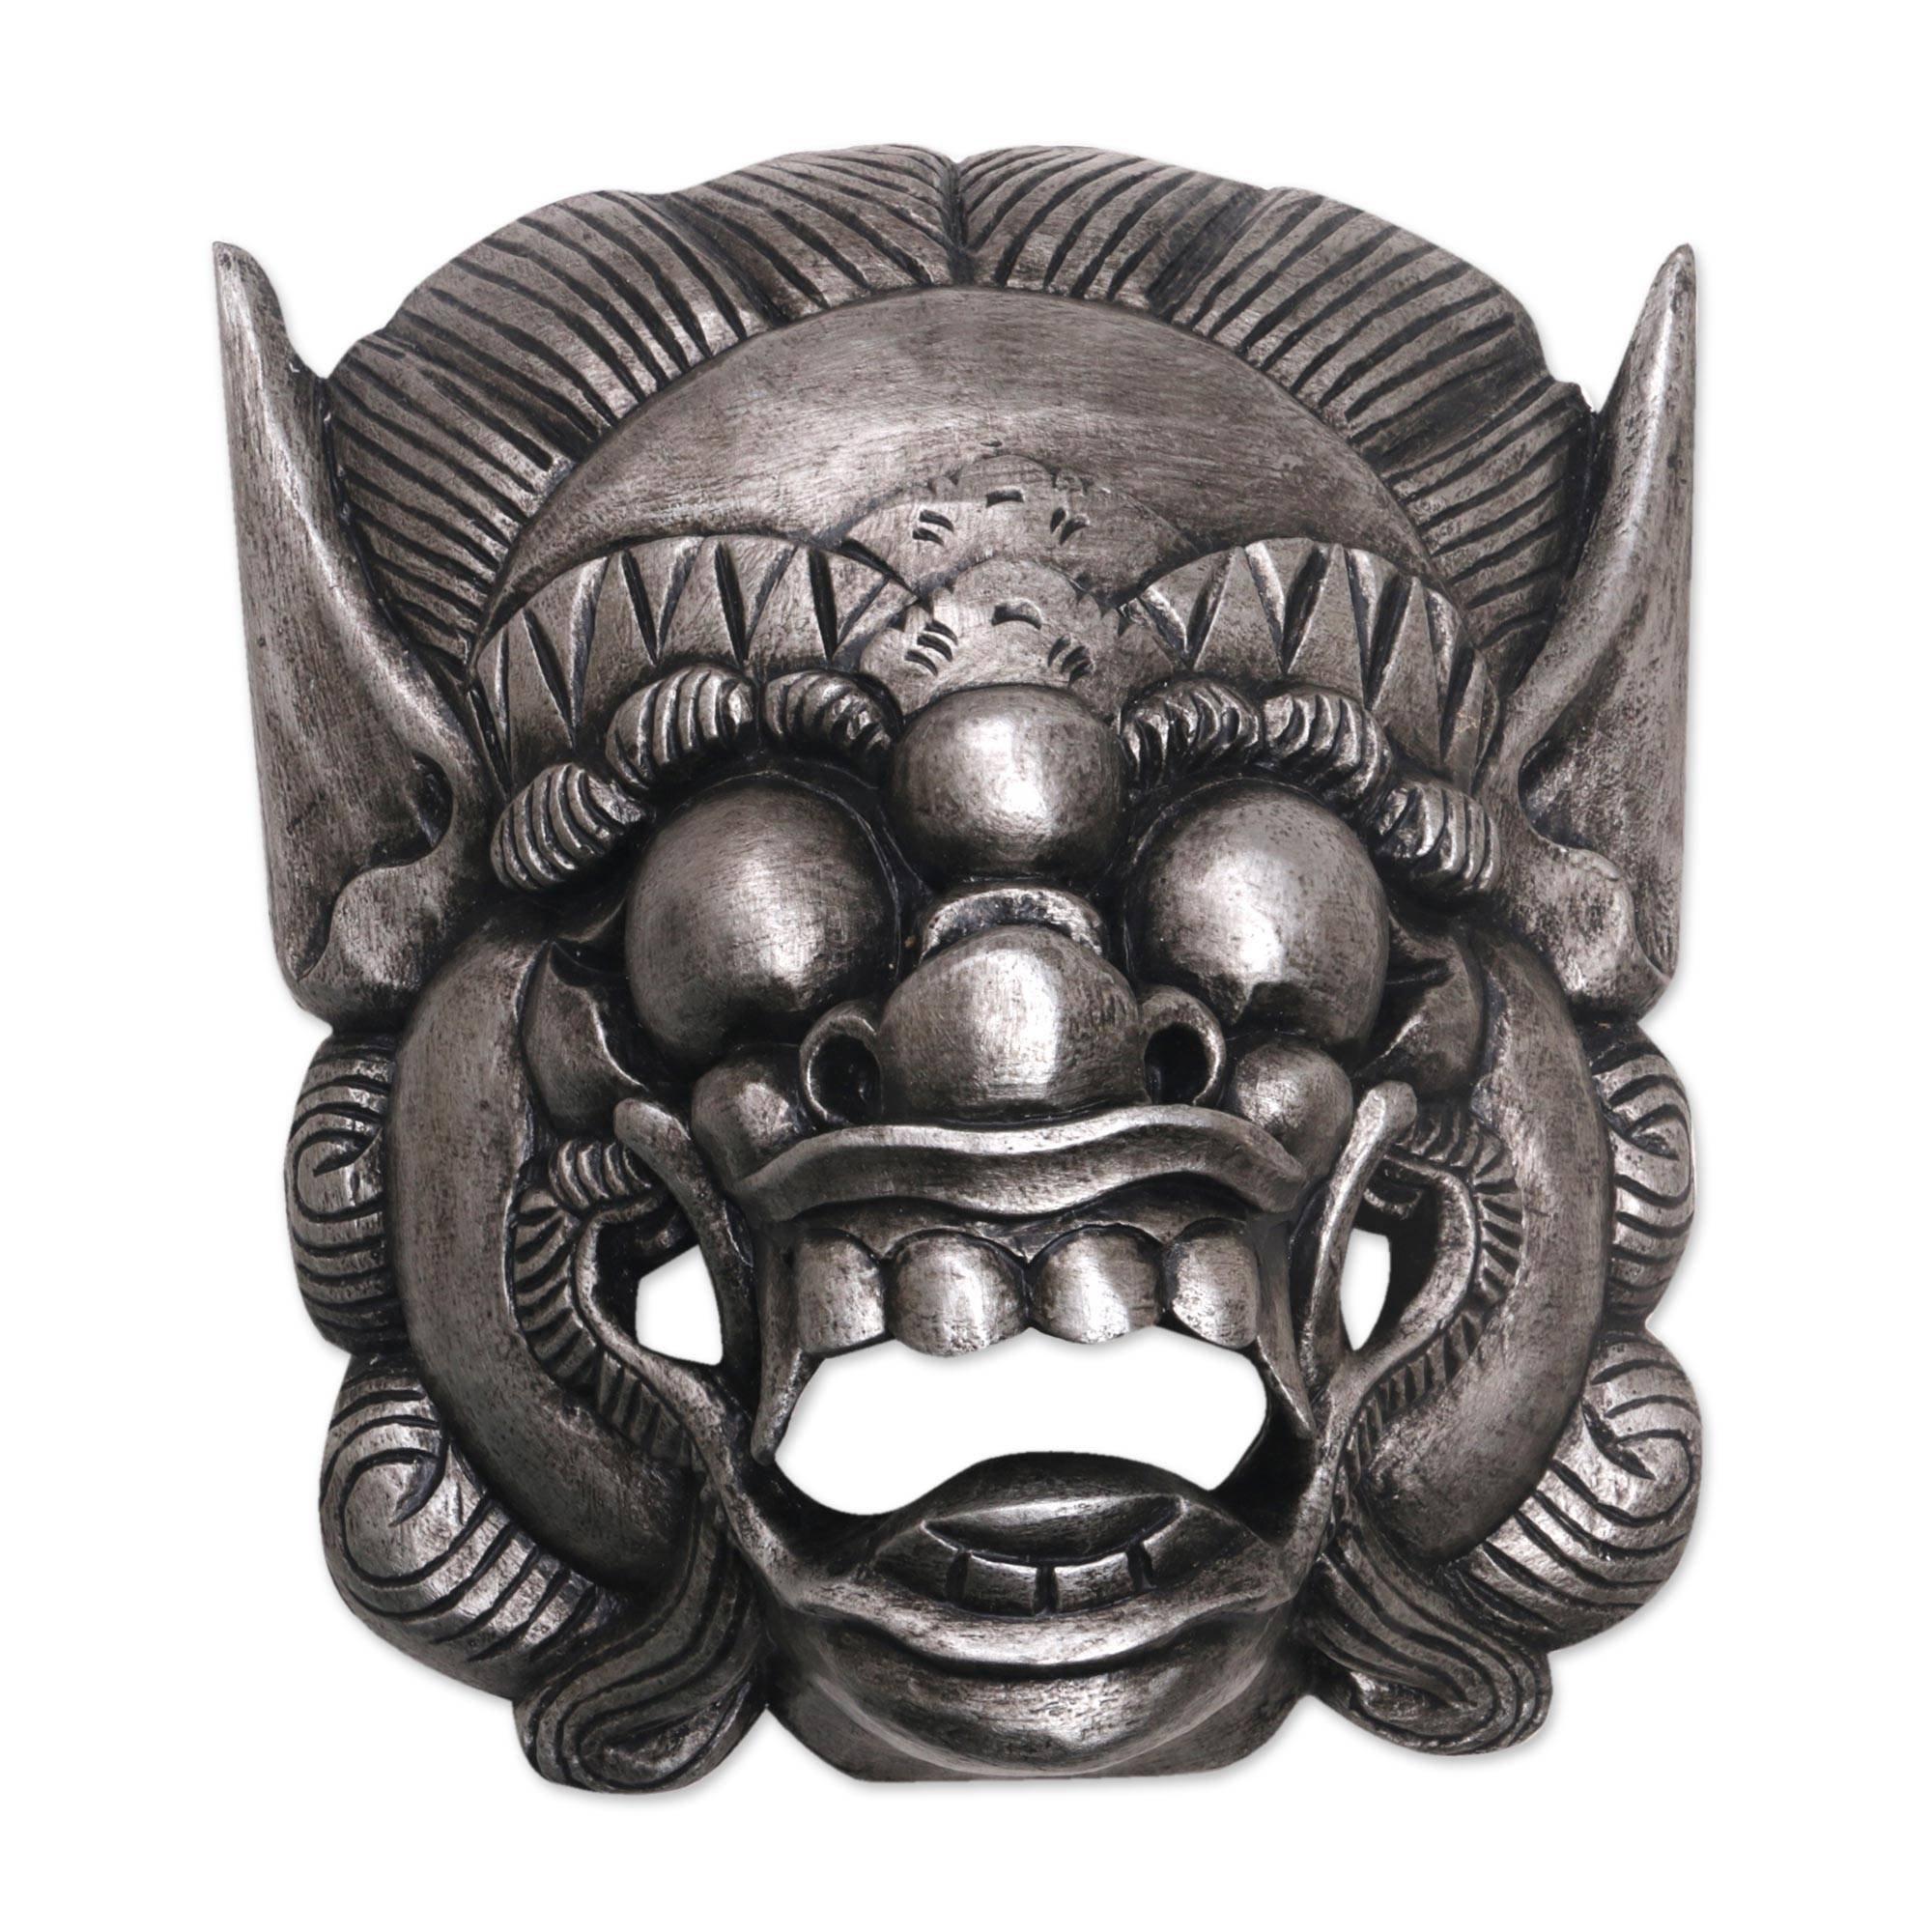 NOVICA Cultural Decorative Wood Mask, Grey, Barong Celeng' by NOVICA